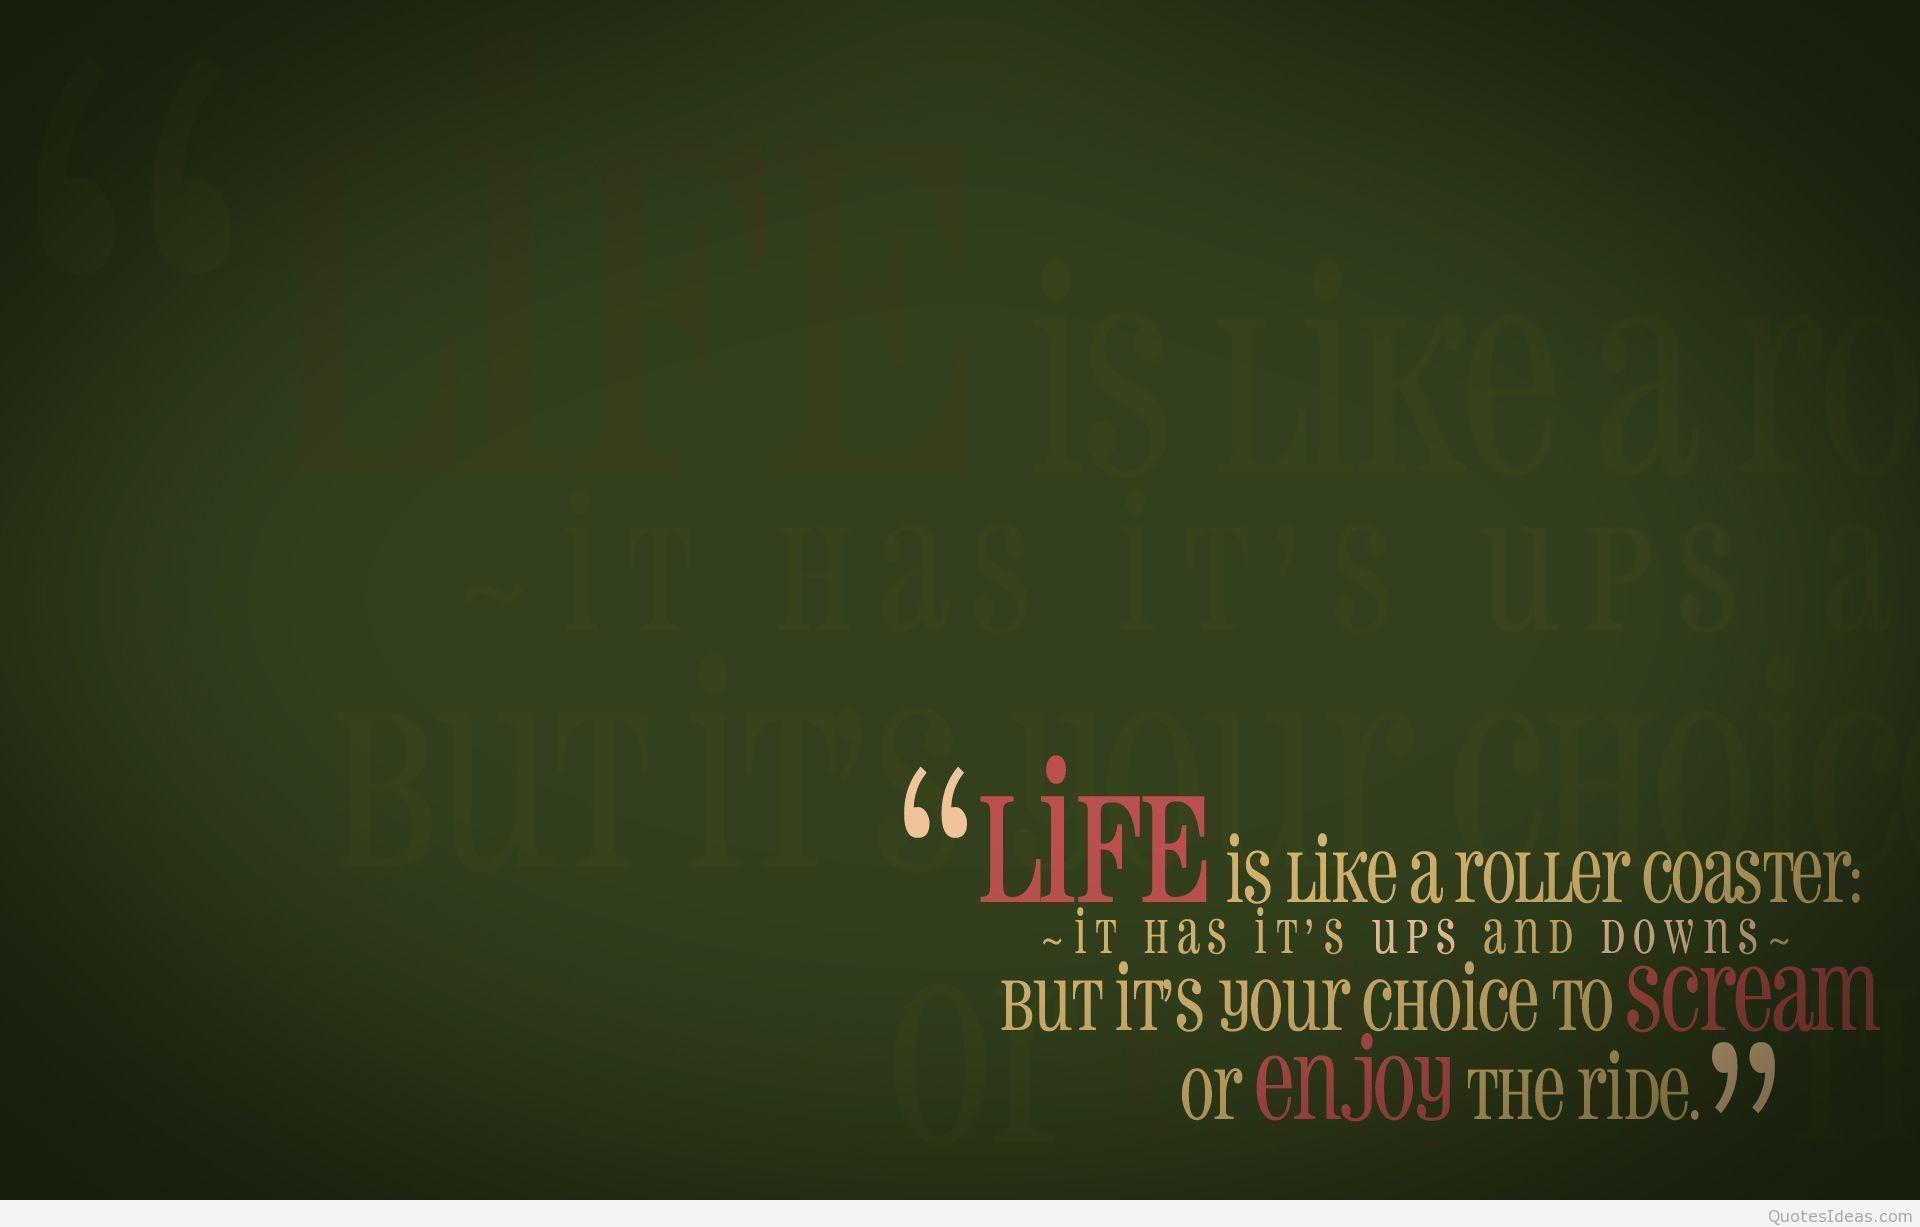 Inspirational Quotes Wallpapers Hd For Desktop Group - De Portada Para Facebook - HD Wallpaper